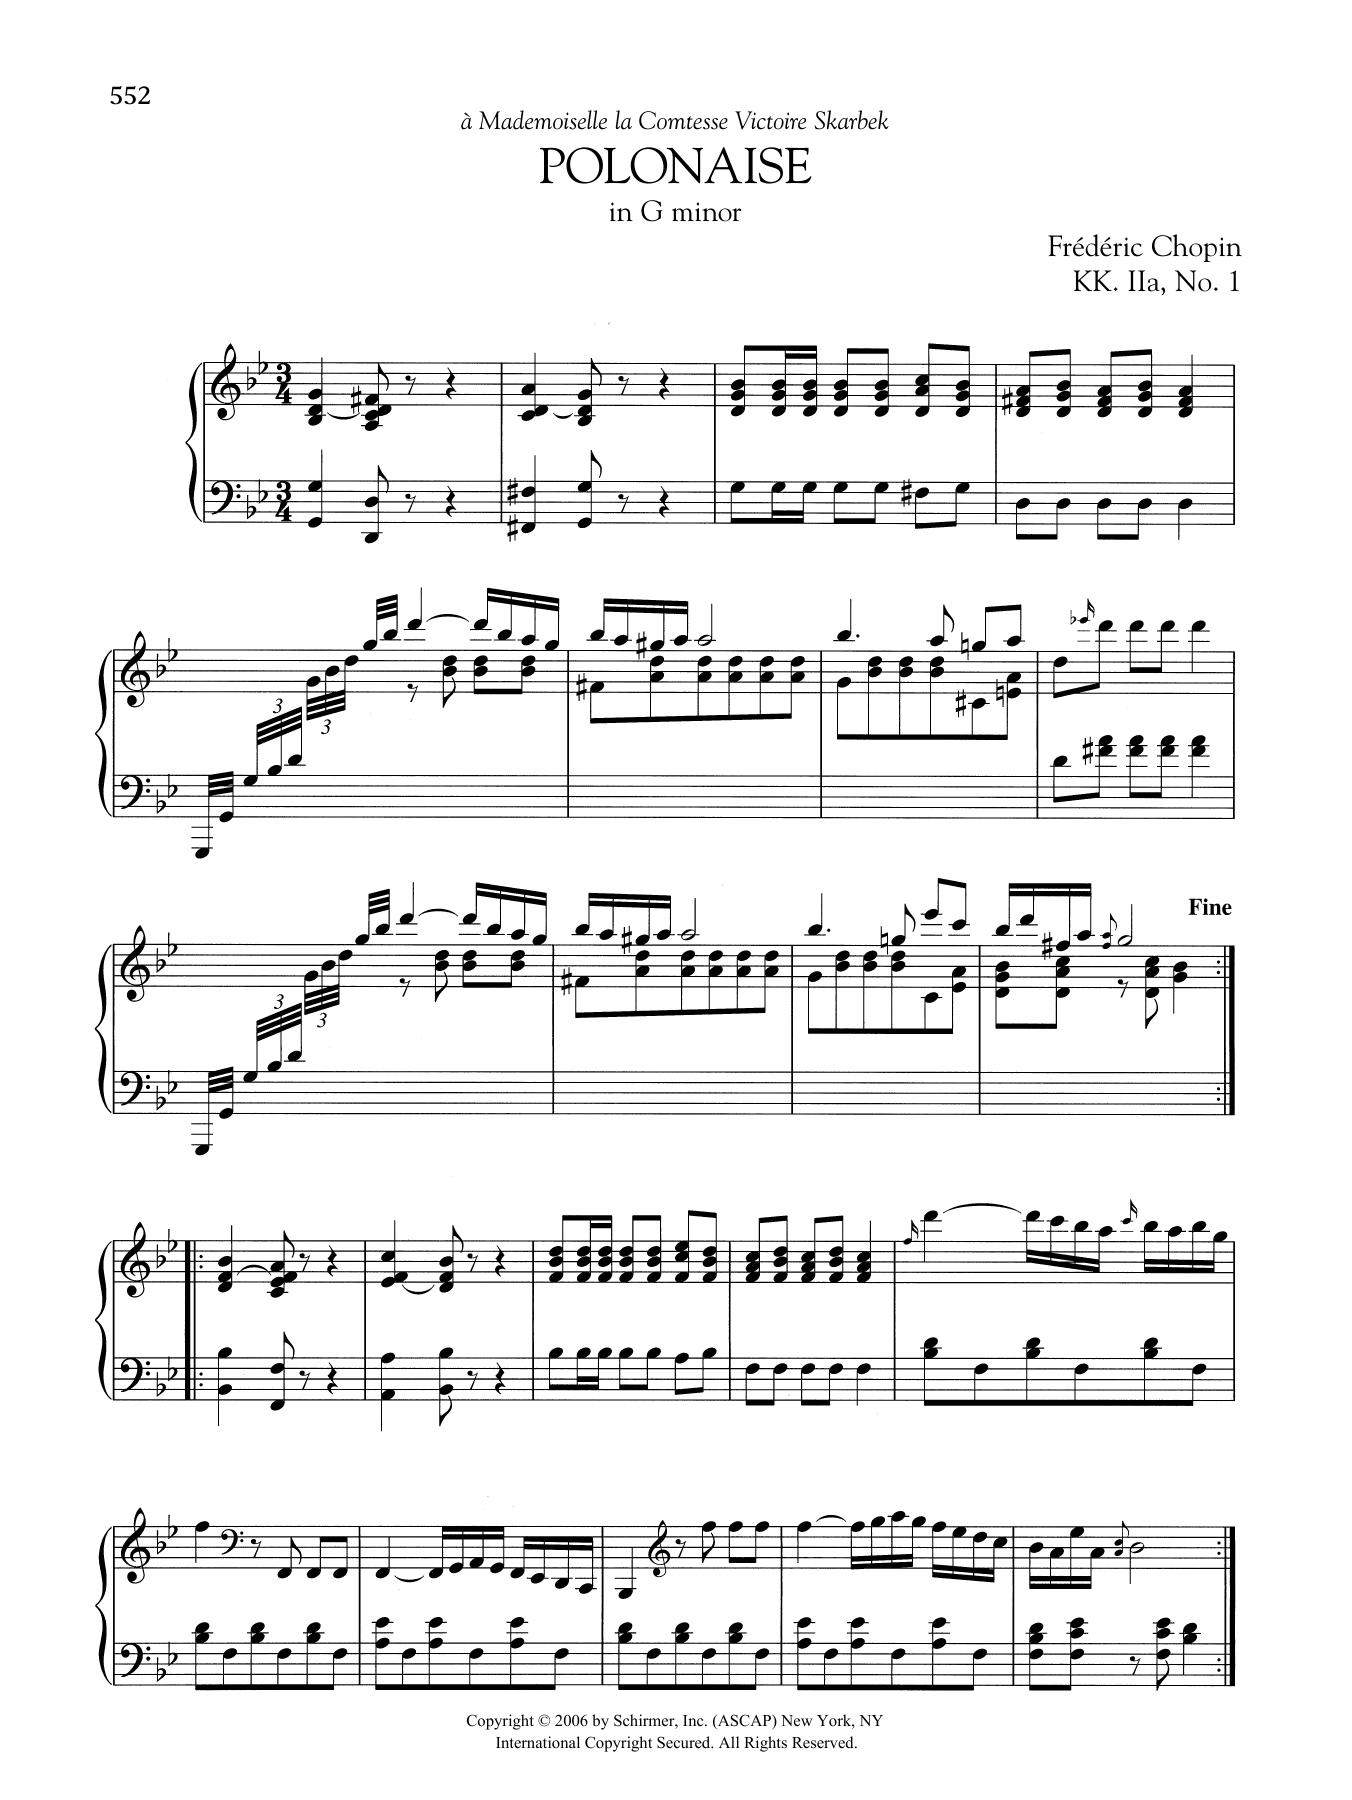 Polonaise in G minor, KK. IIa, No. 1 Sheet Music